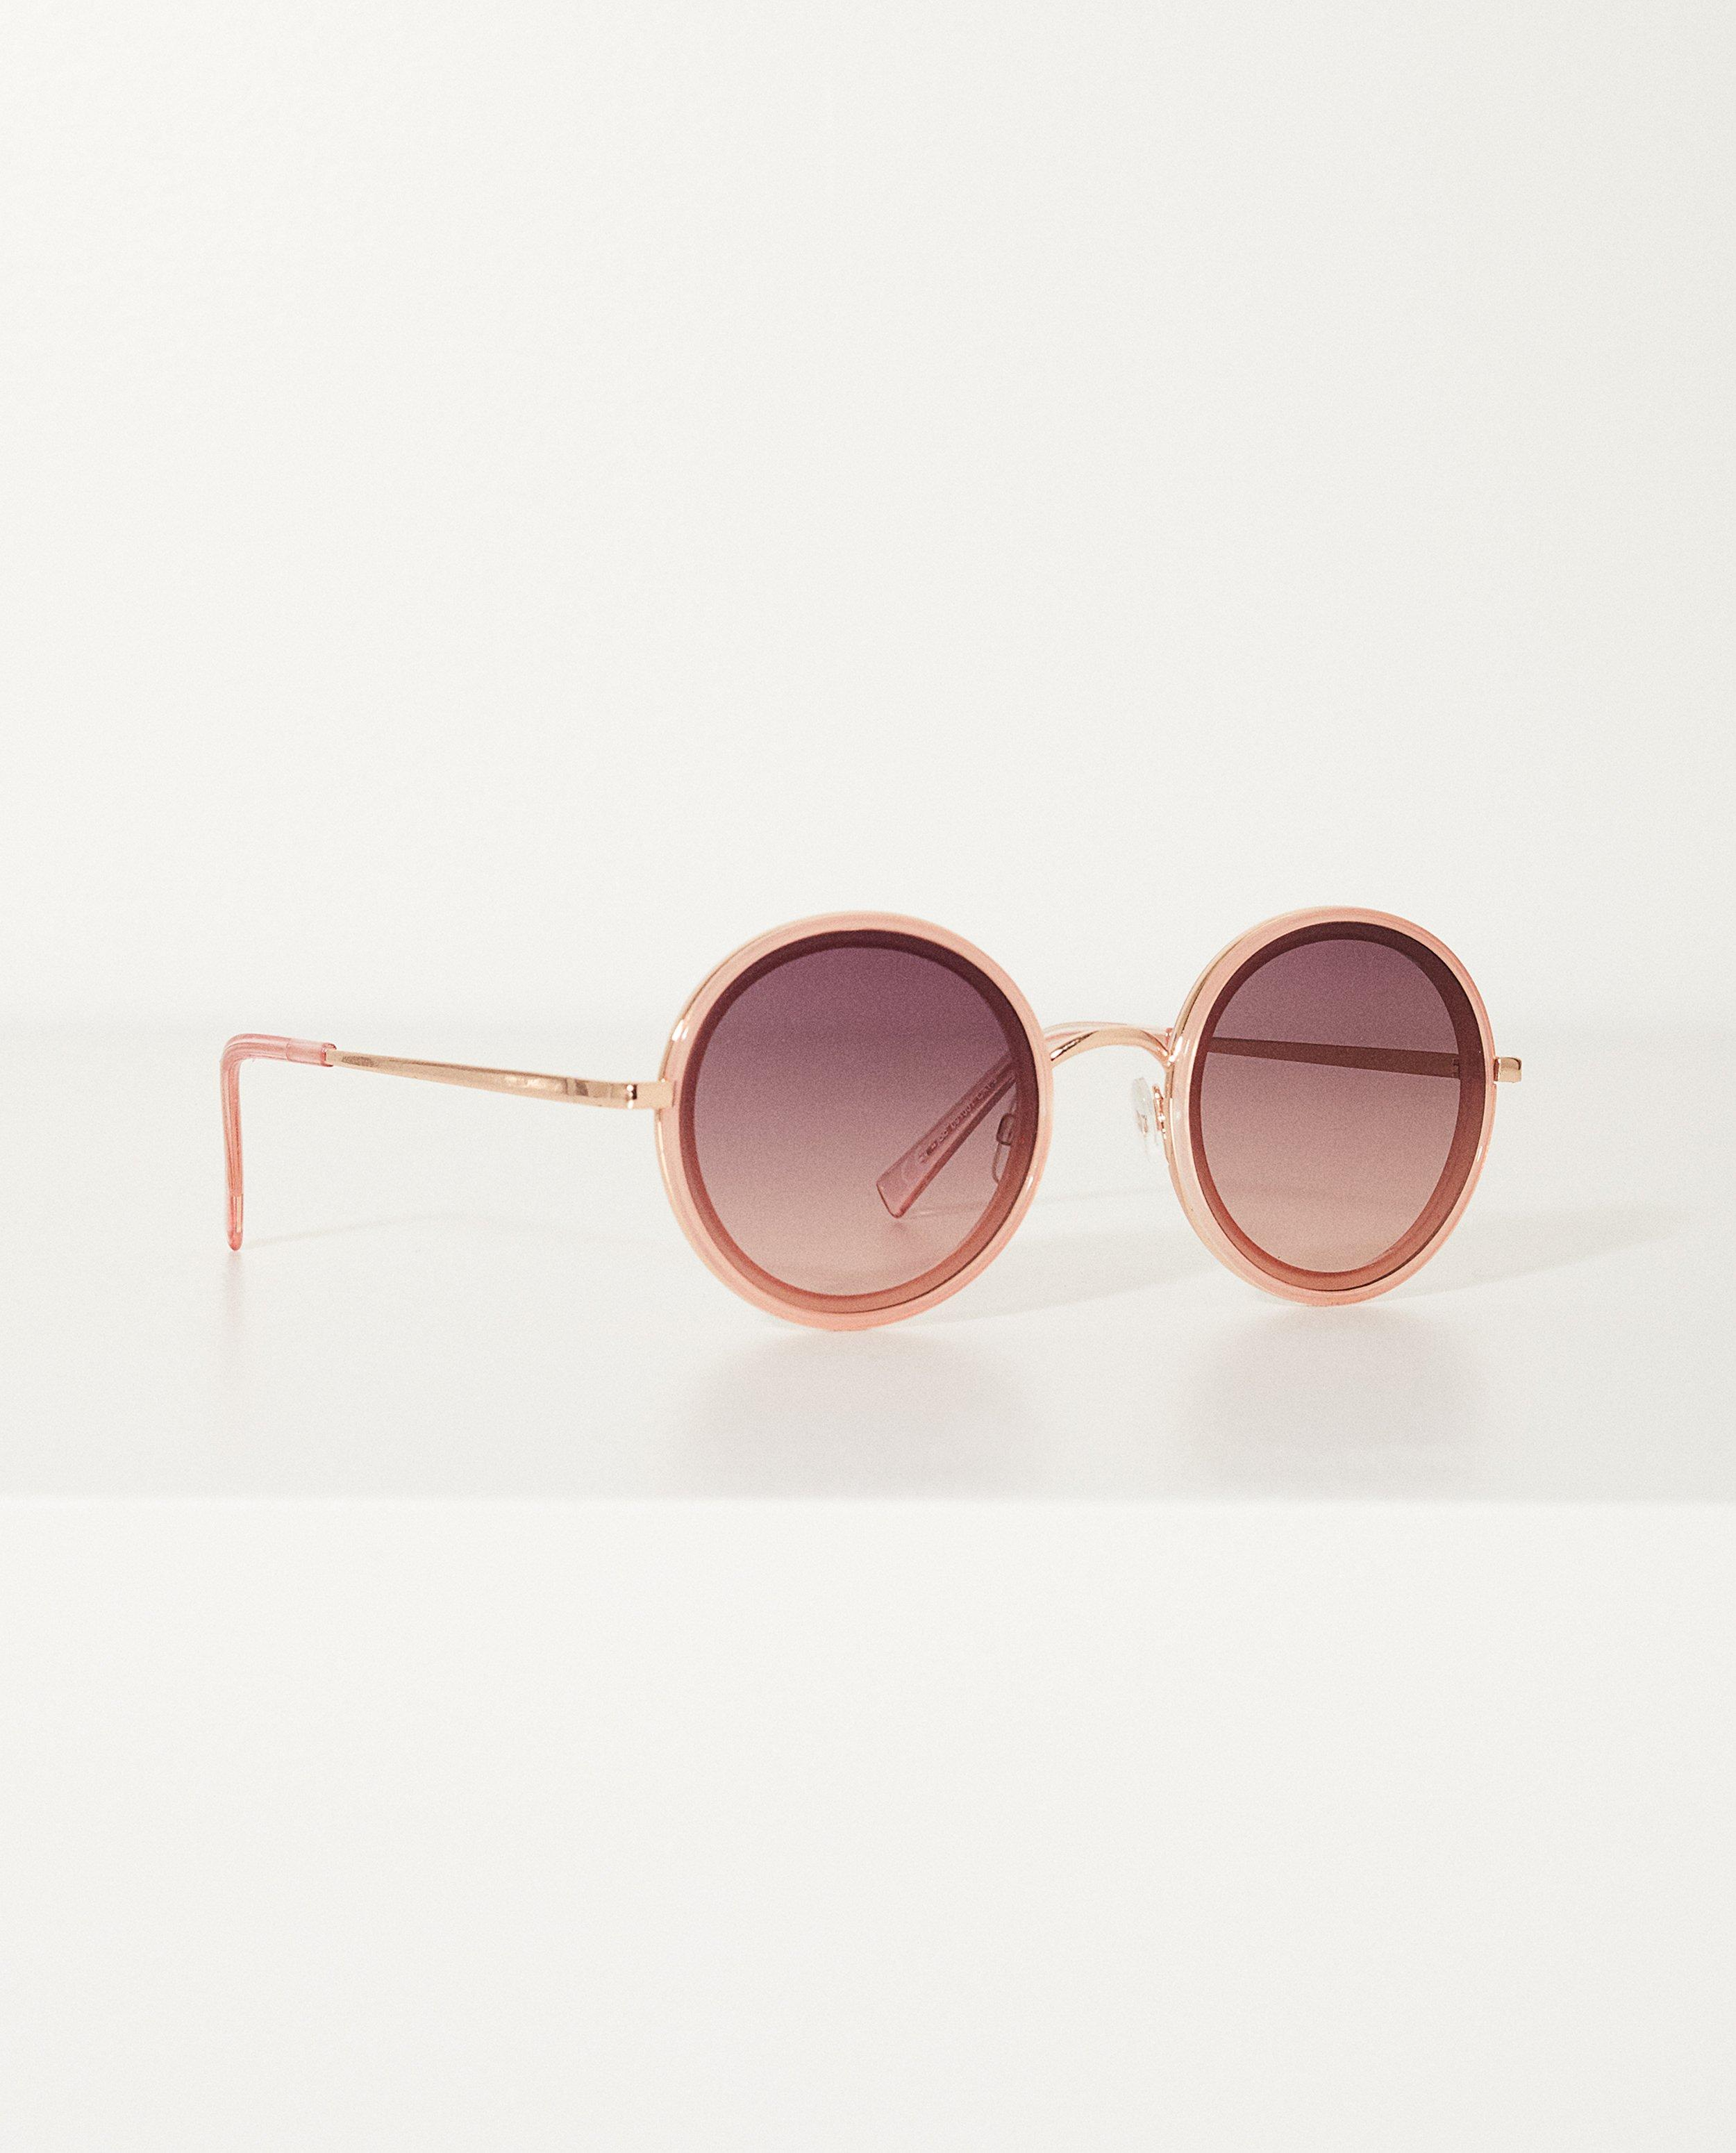 5cb485e1989cca Roze zonnebril Met ronde glazen